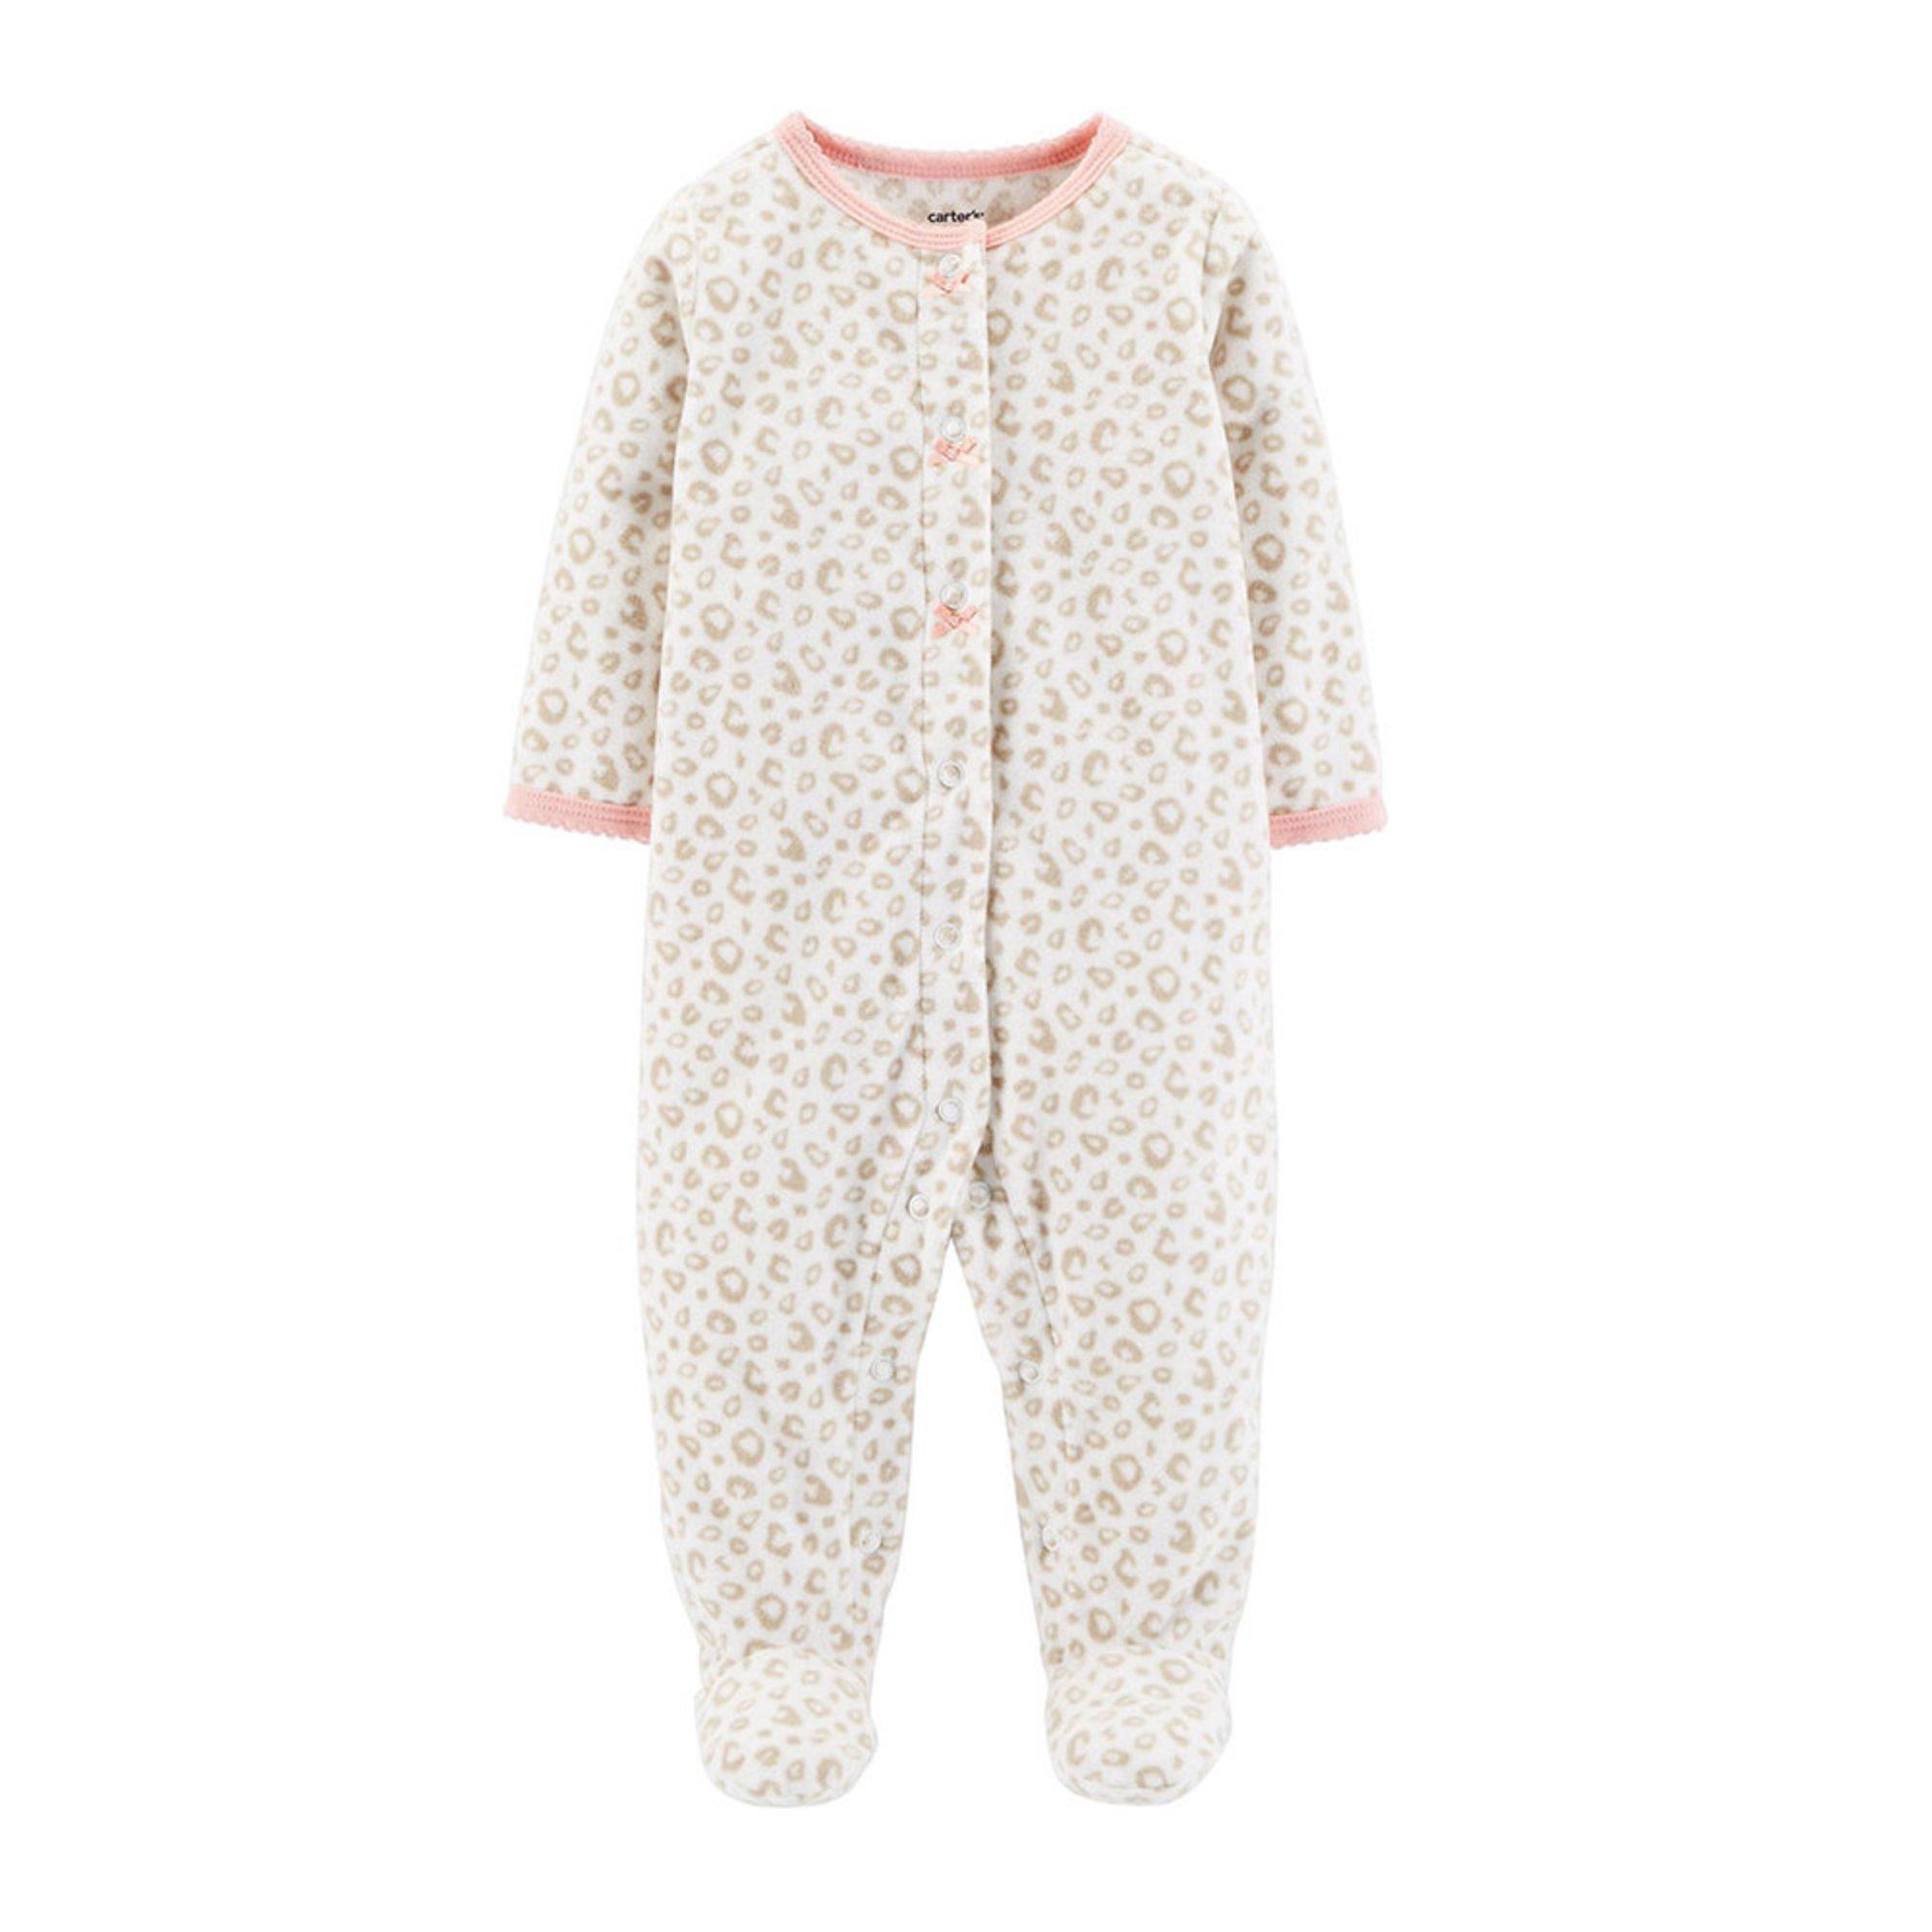 16d64778a6e7 Carter s Baby Girls  Micro Fleece Sleep N  Play